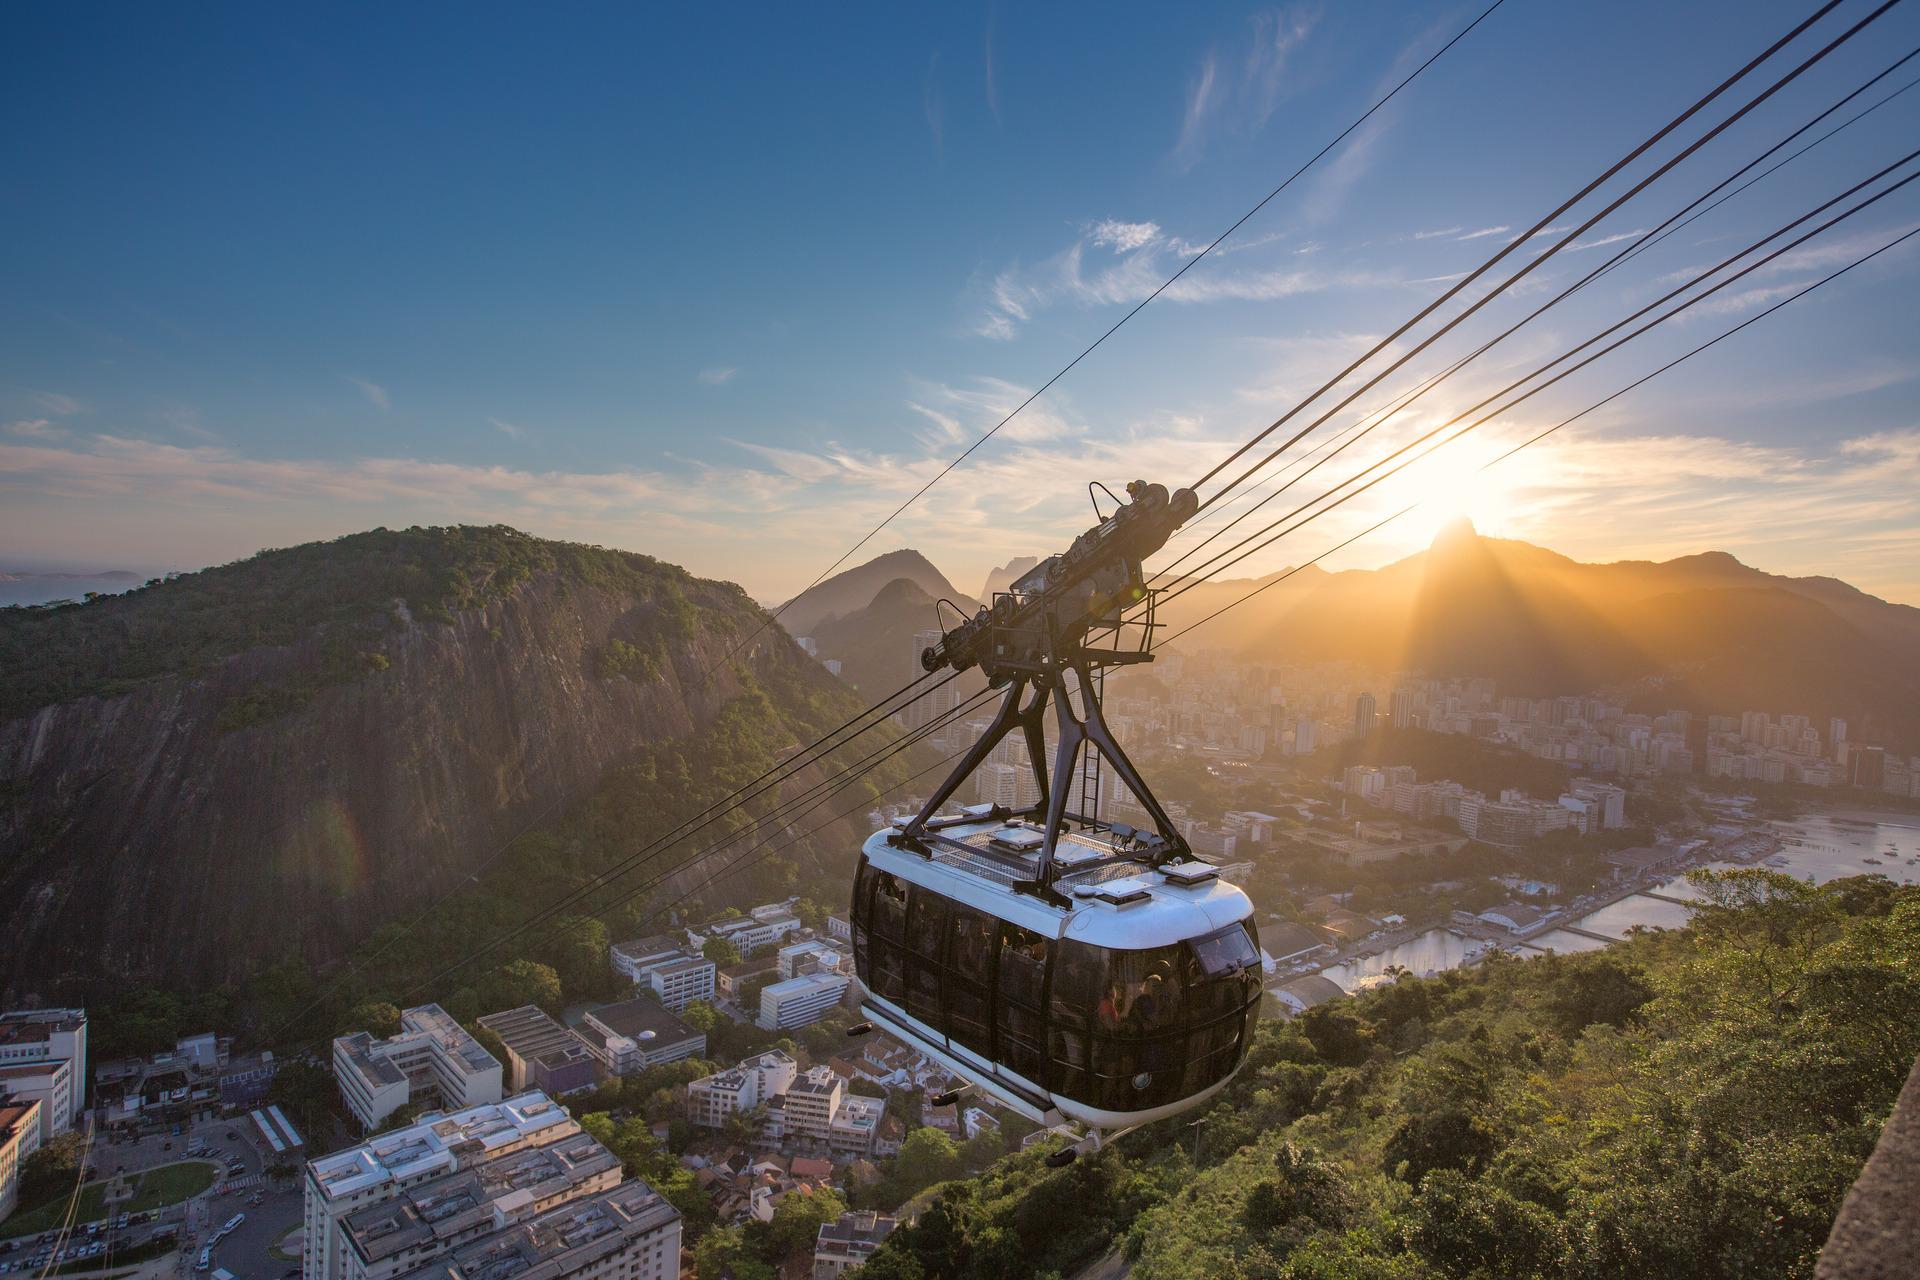 RIO DE JANEIRO, PAO DE ACUCAR, COPACABANA, LEBLOM, IPANEMA, RJ, BRASIL, FINE ART, FINEART, FOTOGRAFIA IMPRESSA